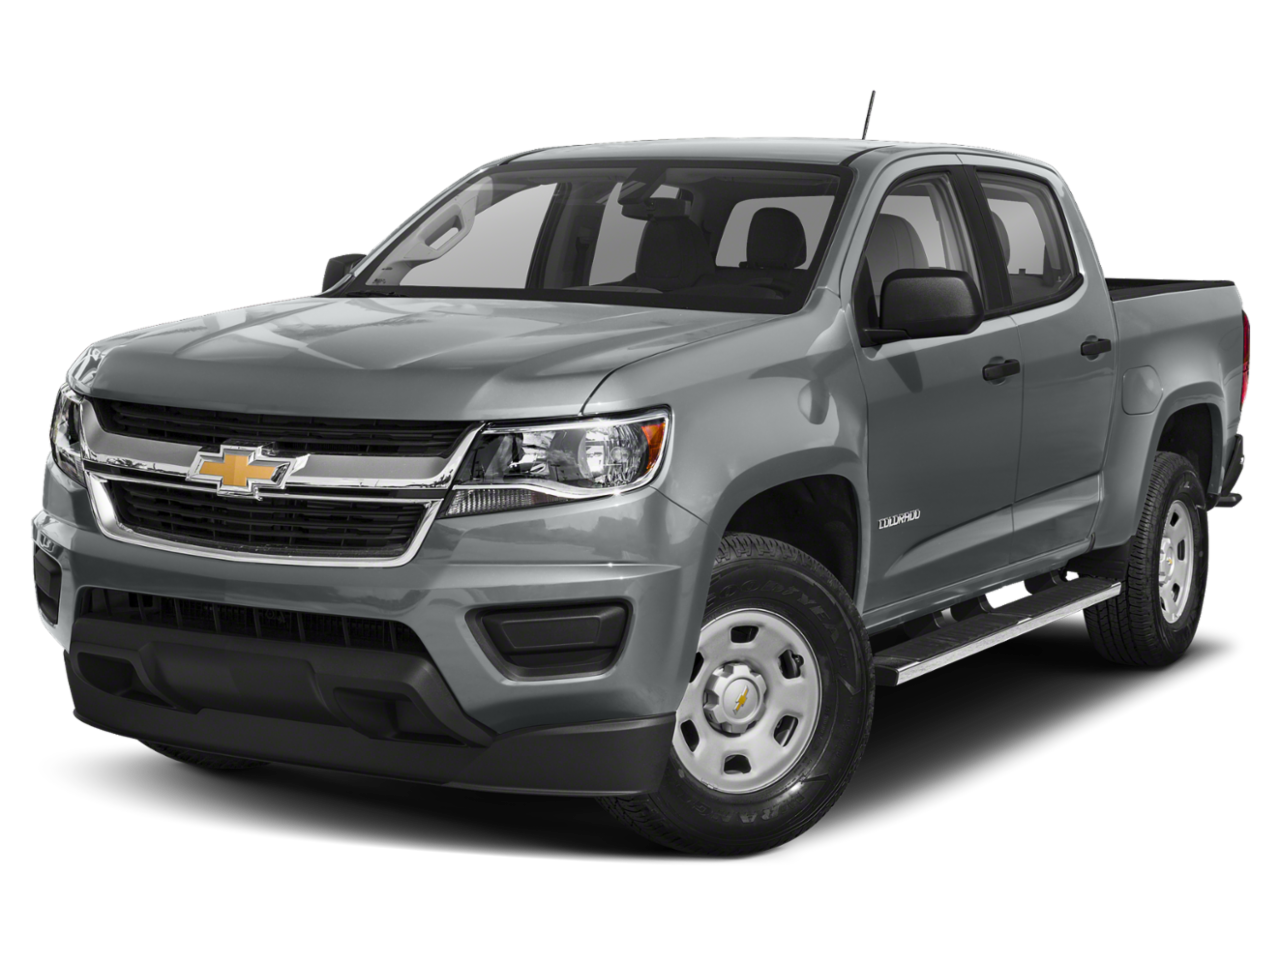 2020 Chevrolet Colorado 2WD LT RWD Crew Cab Pickup